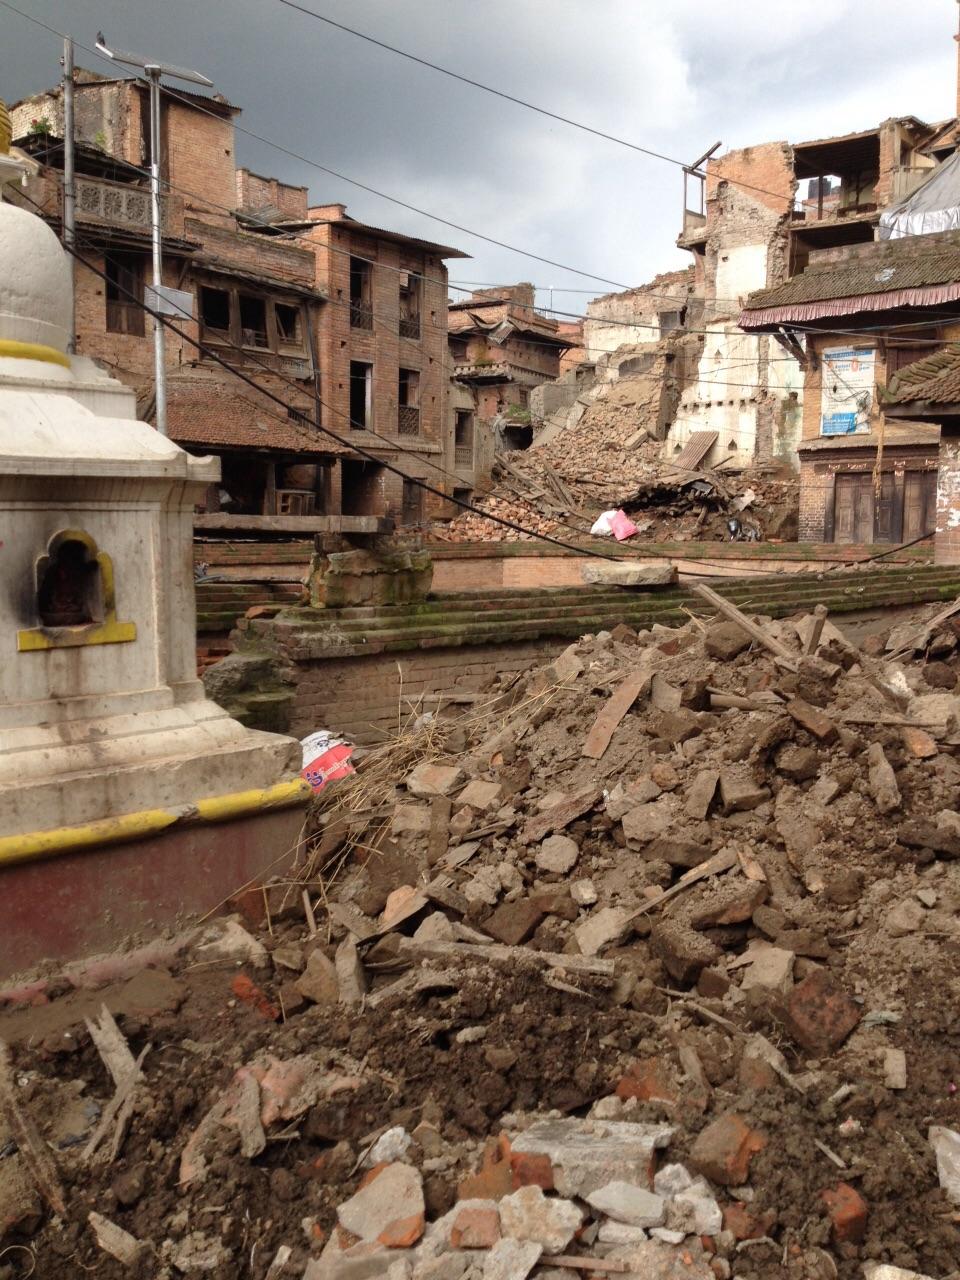 Ingestorte huizen na aardbeving in Nepal (bron: http://www.namasteprojects.nl/)